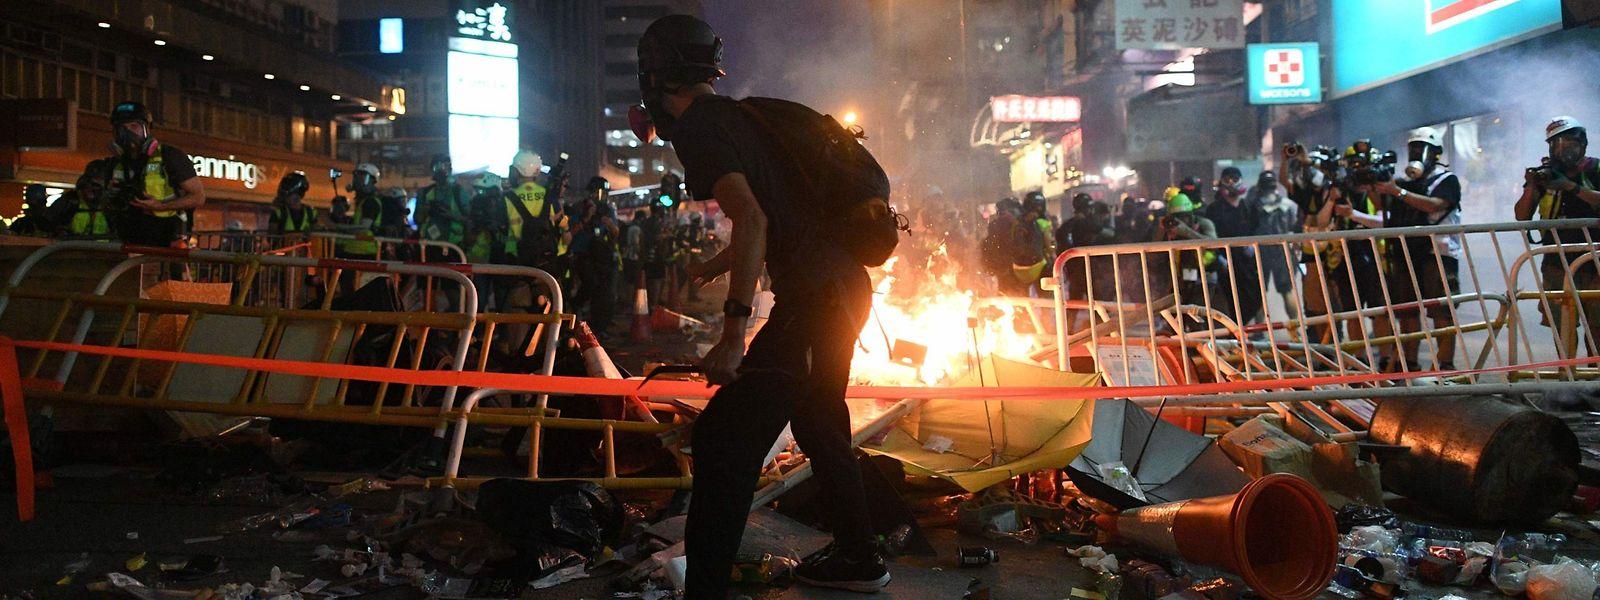 Radikale Demonstranten legten mehrere Feuer.